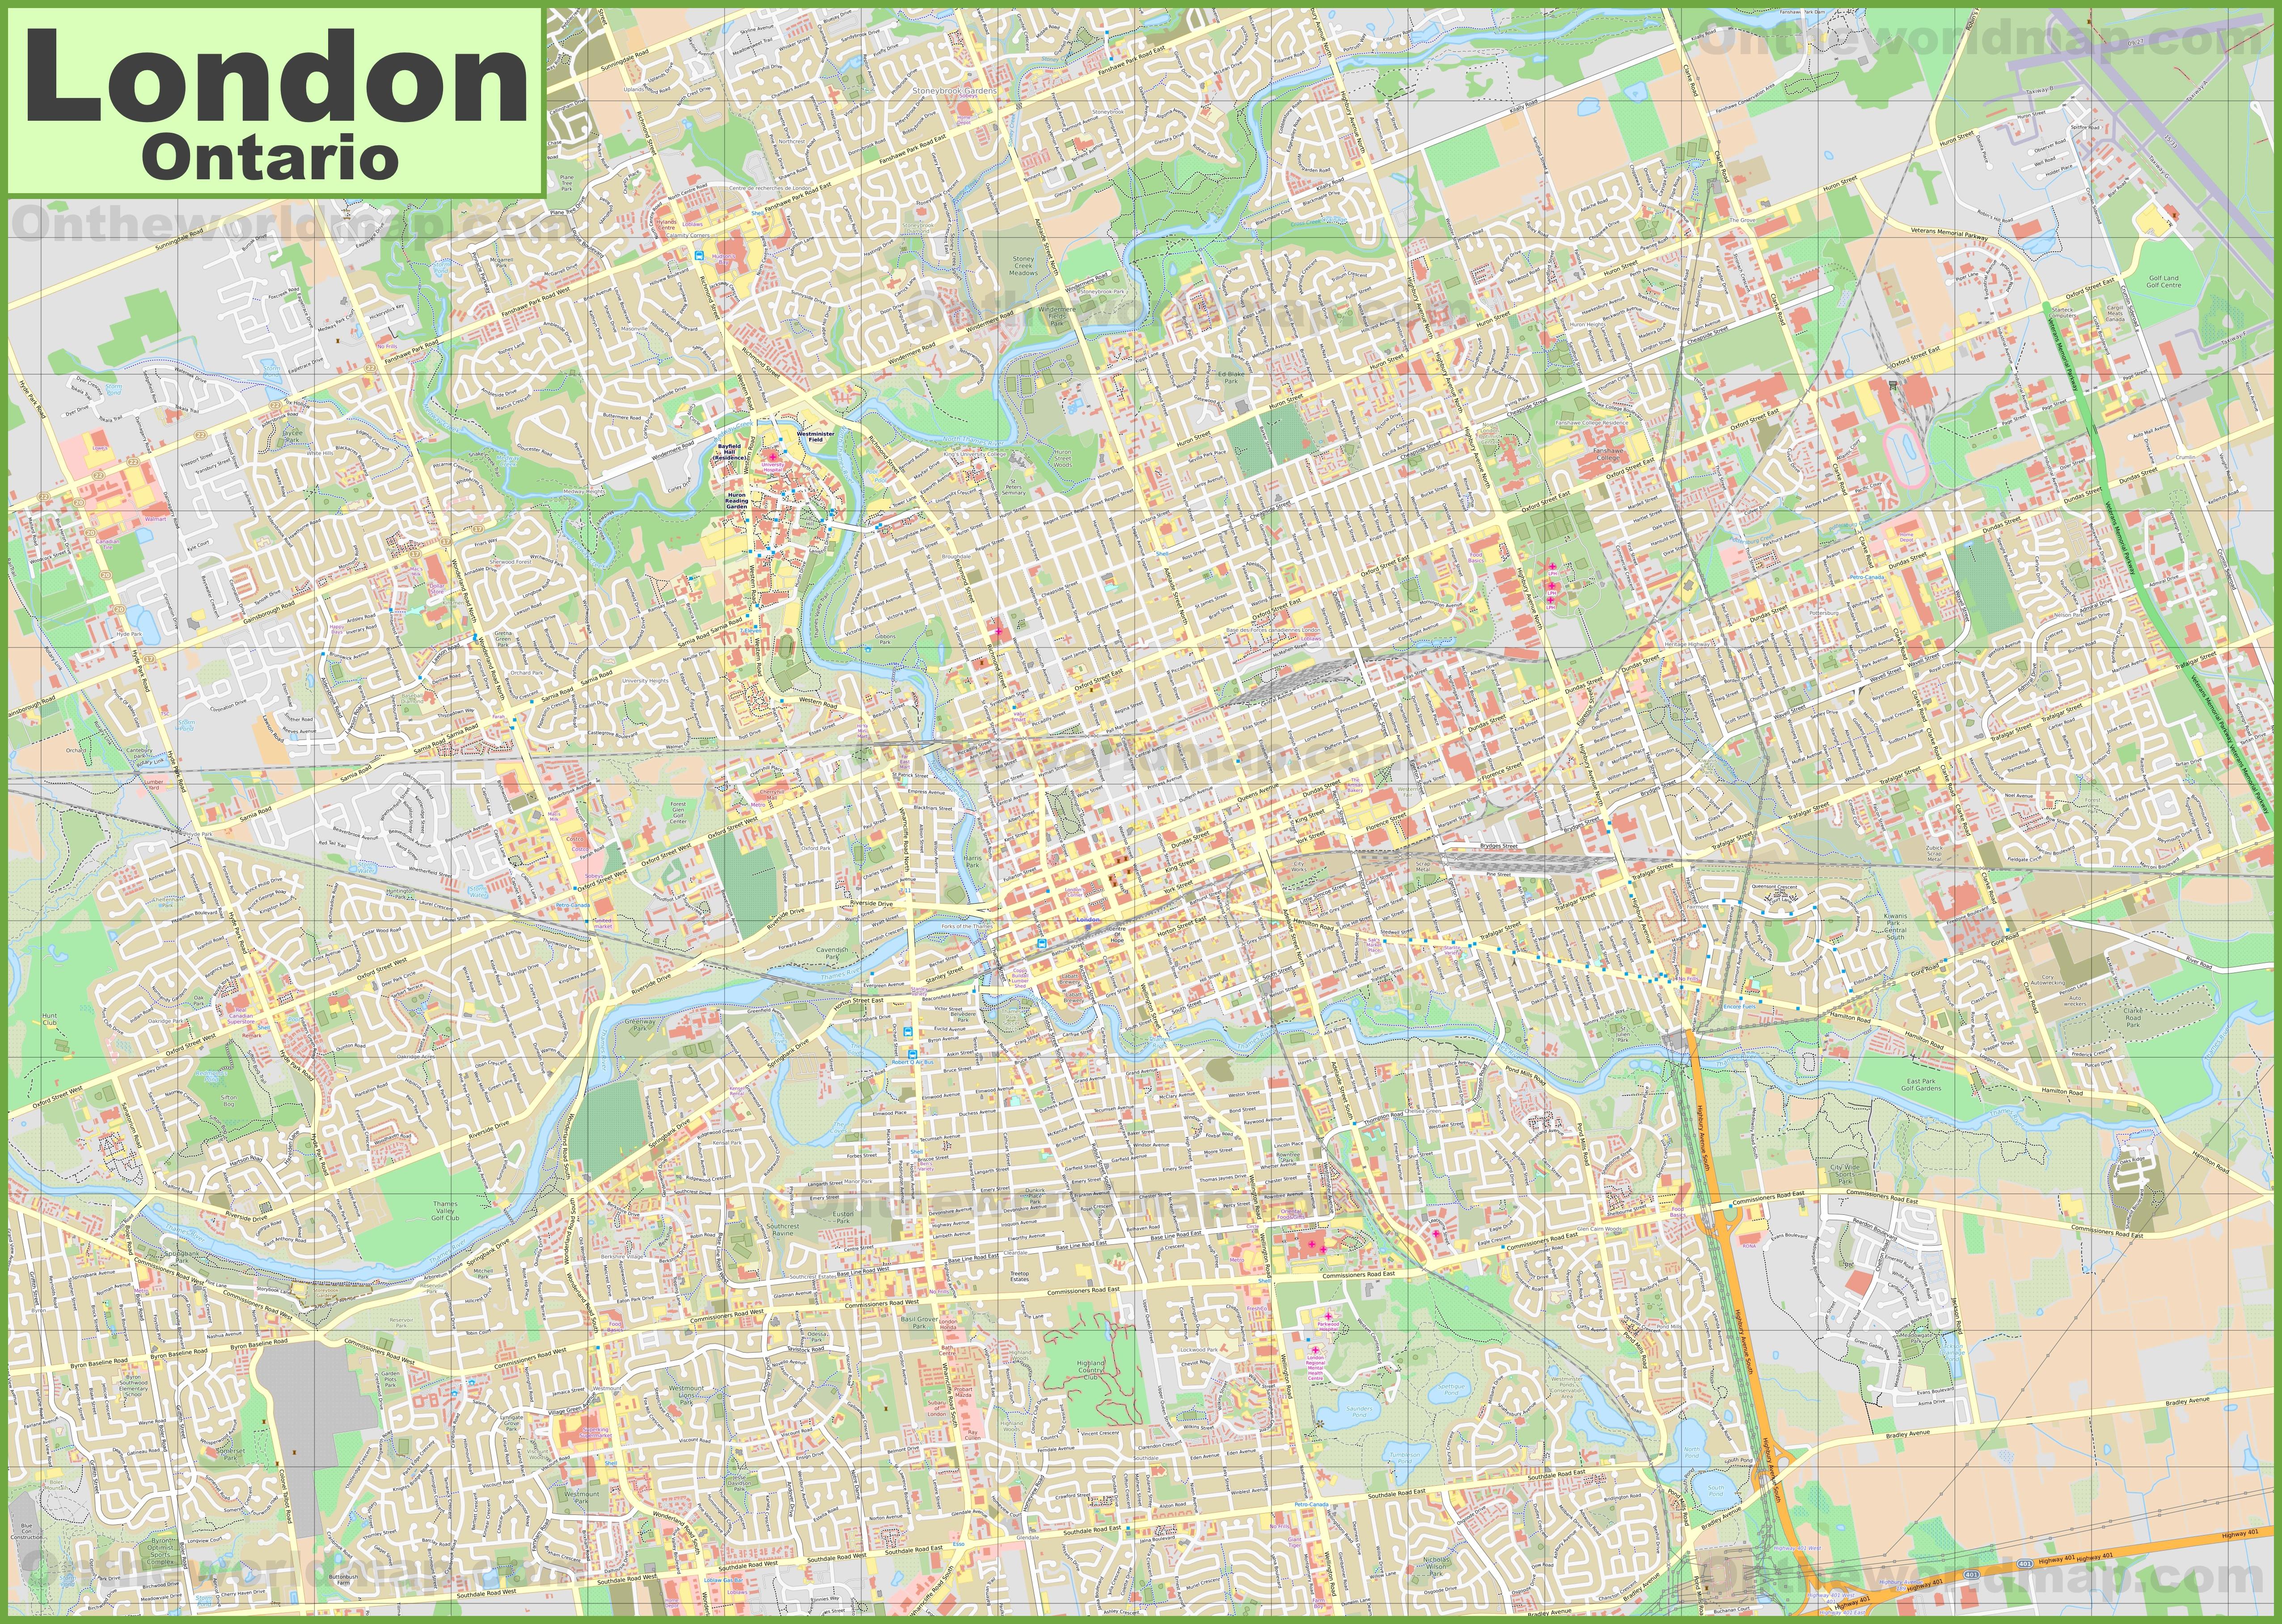 London Ontario Map Large detailed map of London (Ontario) London Ontario Map